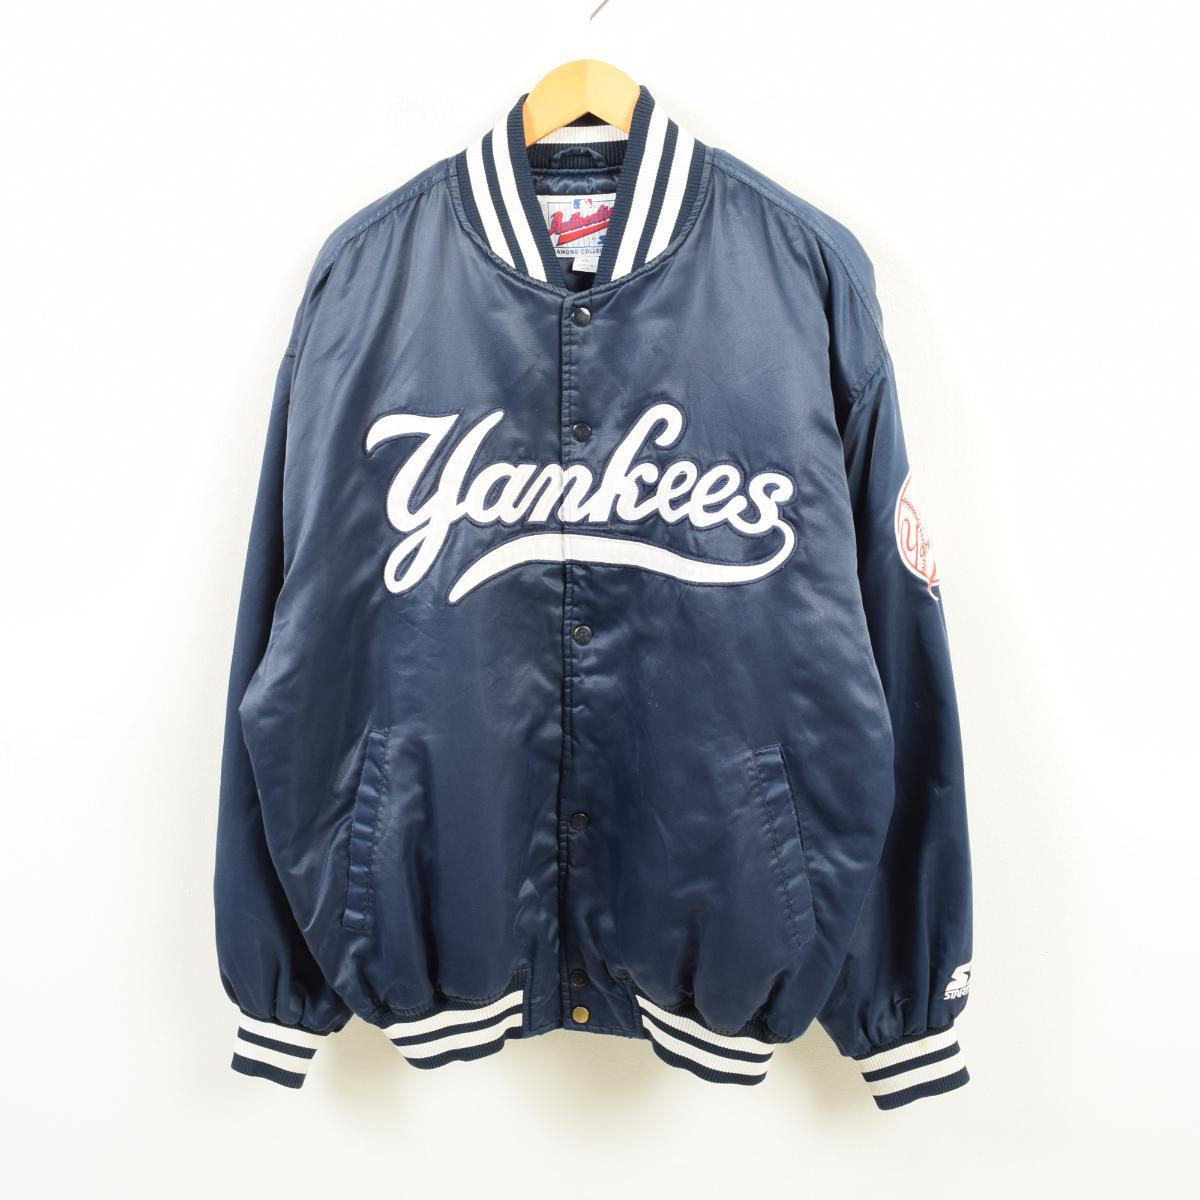 121b8bd940a Starter Starter Diamond COLLECTION MLB NY YANKEES New York Yankees nylon  award jacket Award jacket men ...